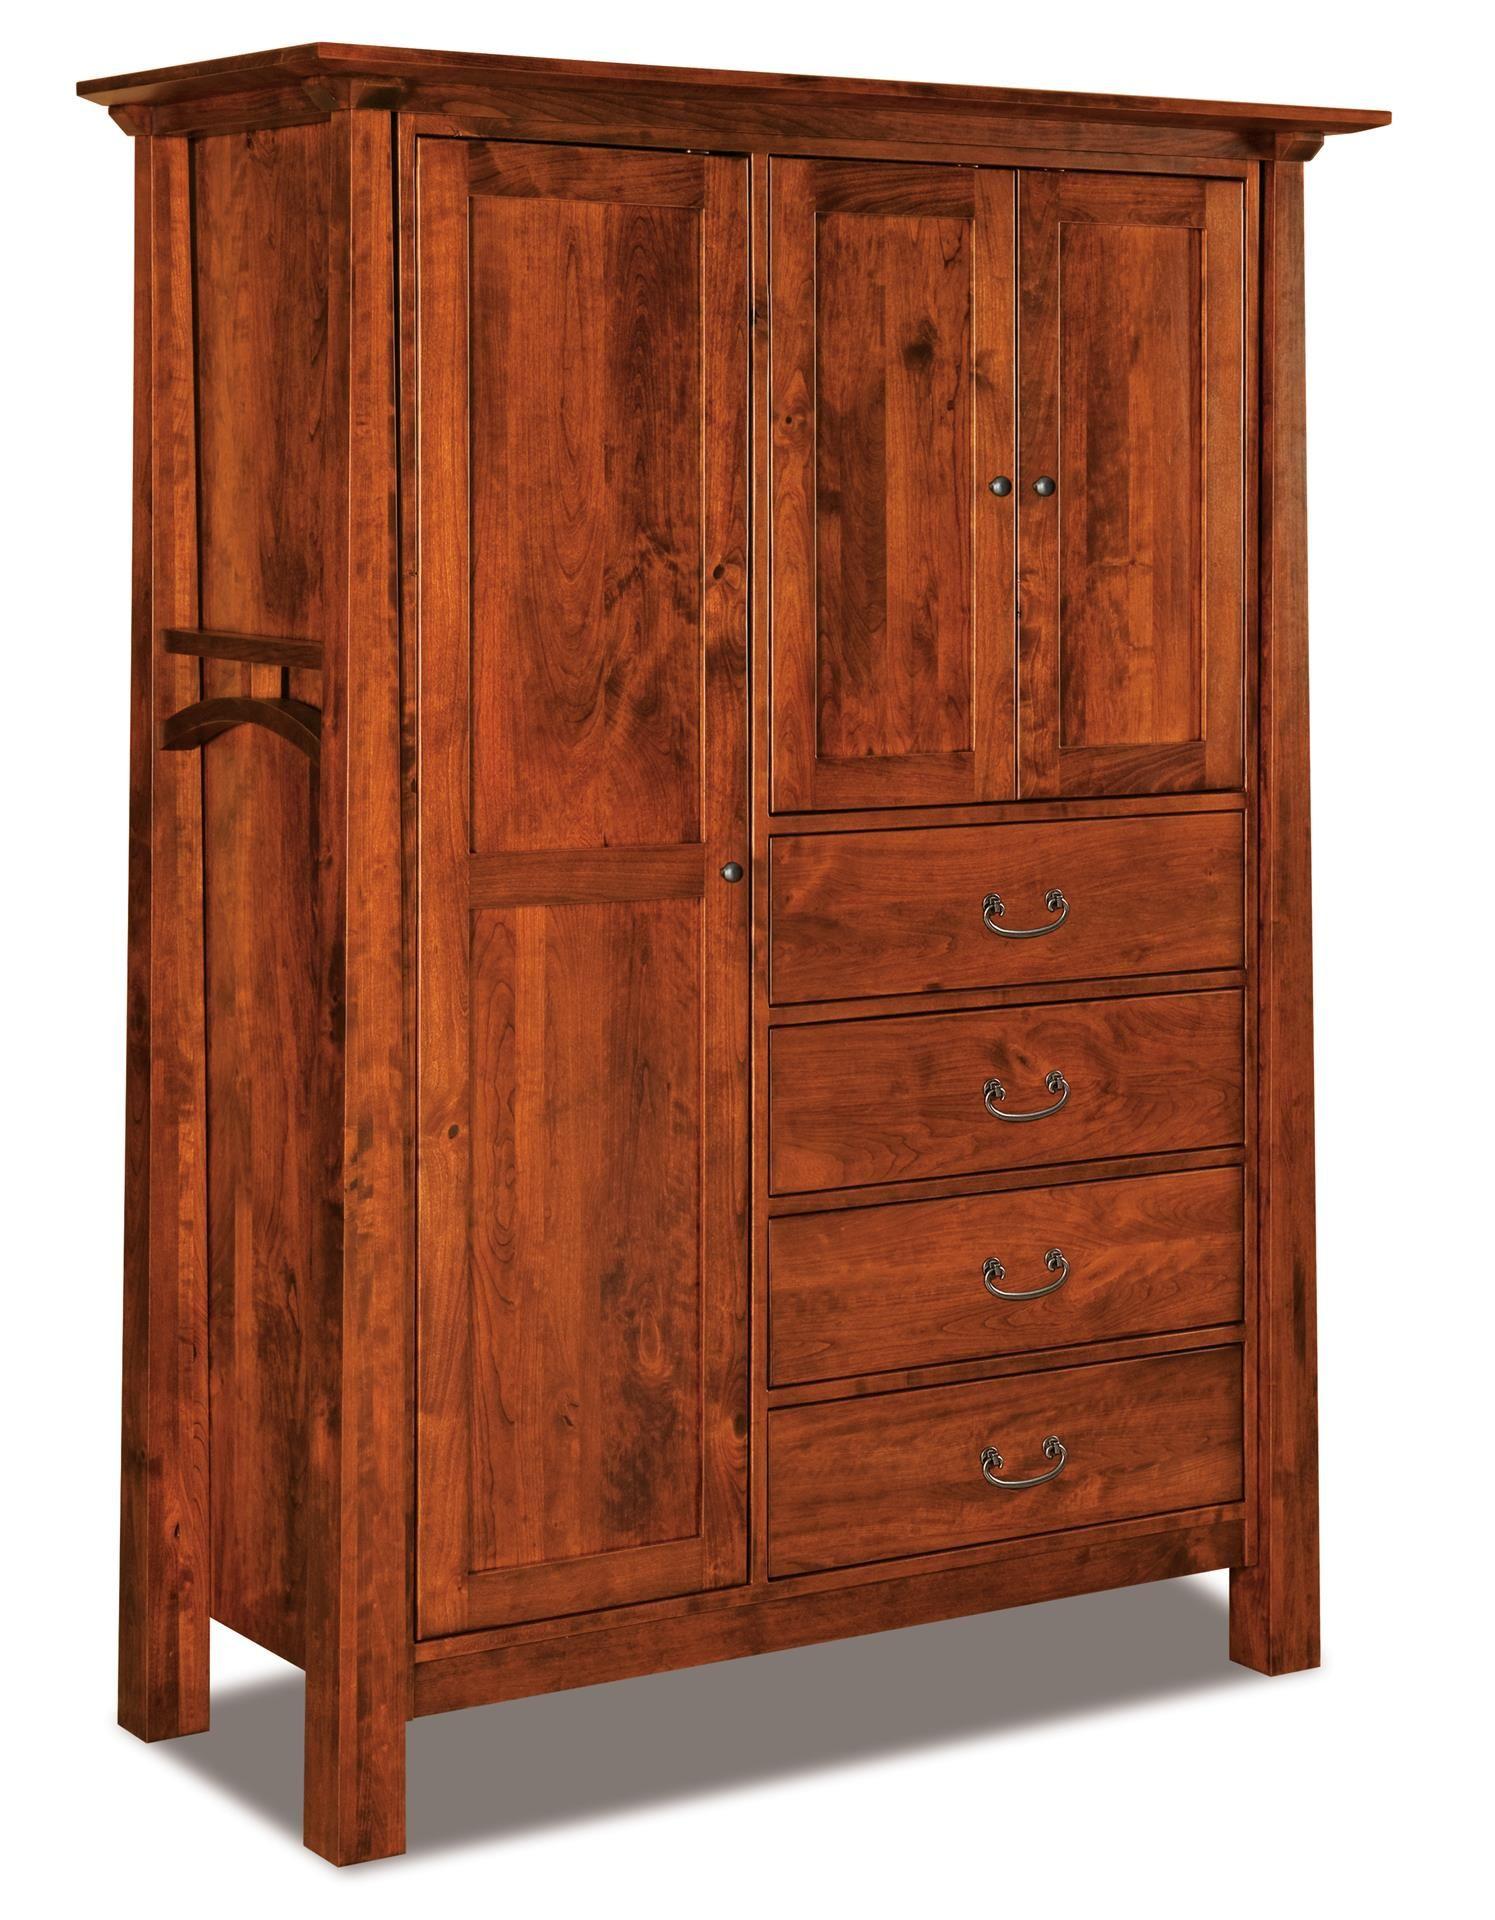 Amish Artesa Chifforobe Bedroom Furniture Pinterest Mission